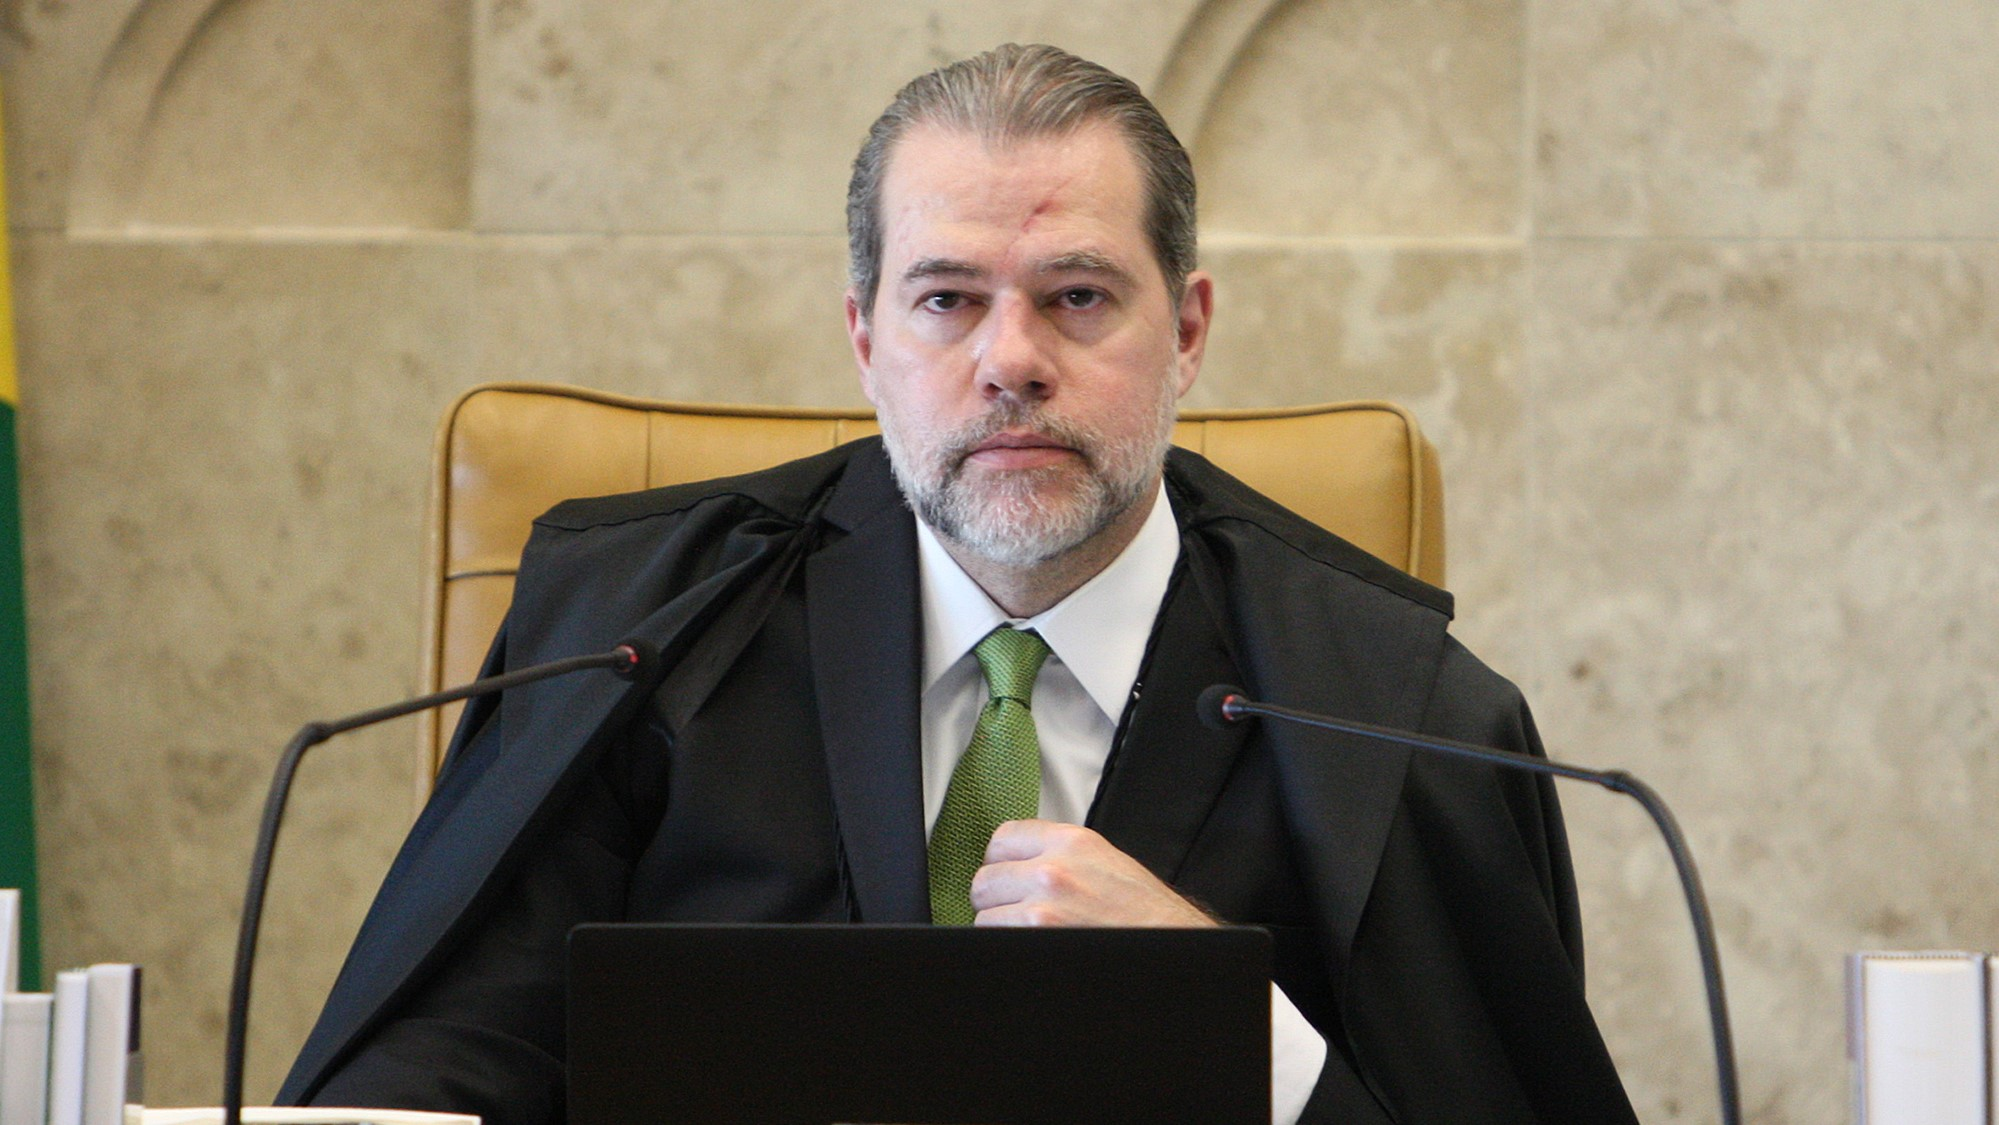 Toffoli nega pedido para obrigar Bolsonaro a desbloquear site no Twitter